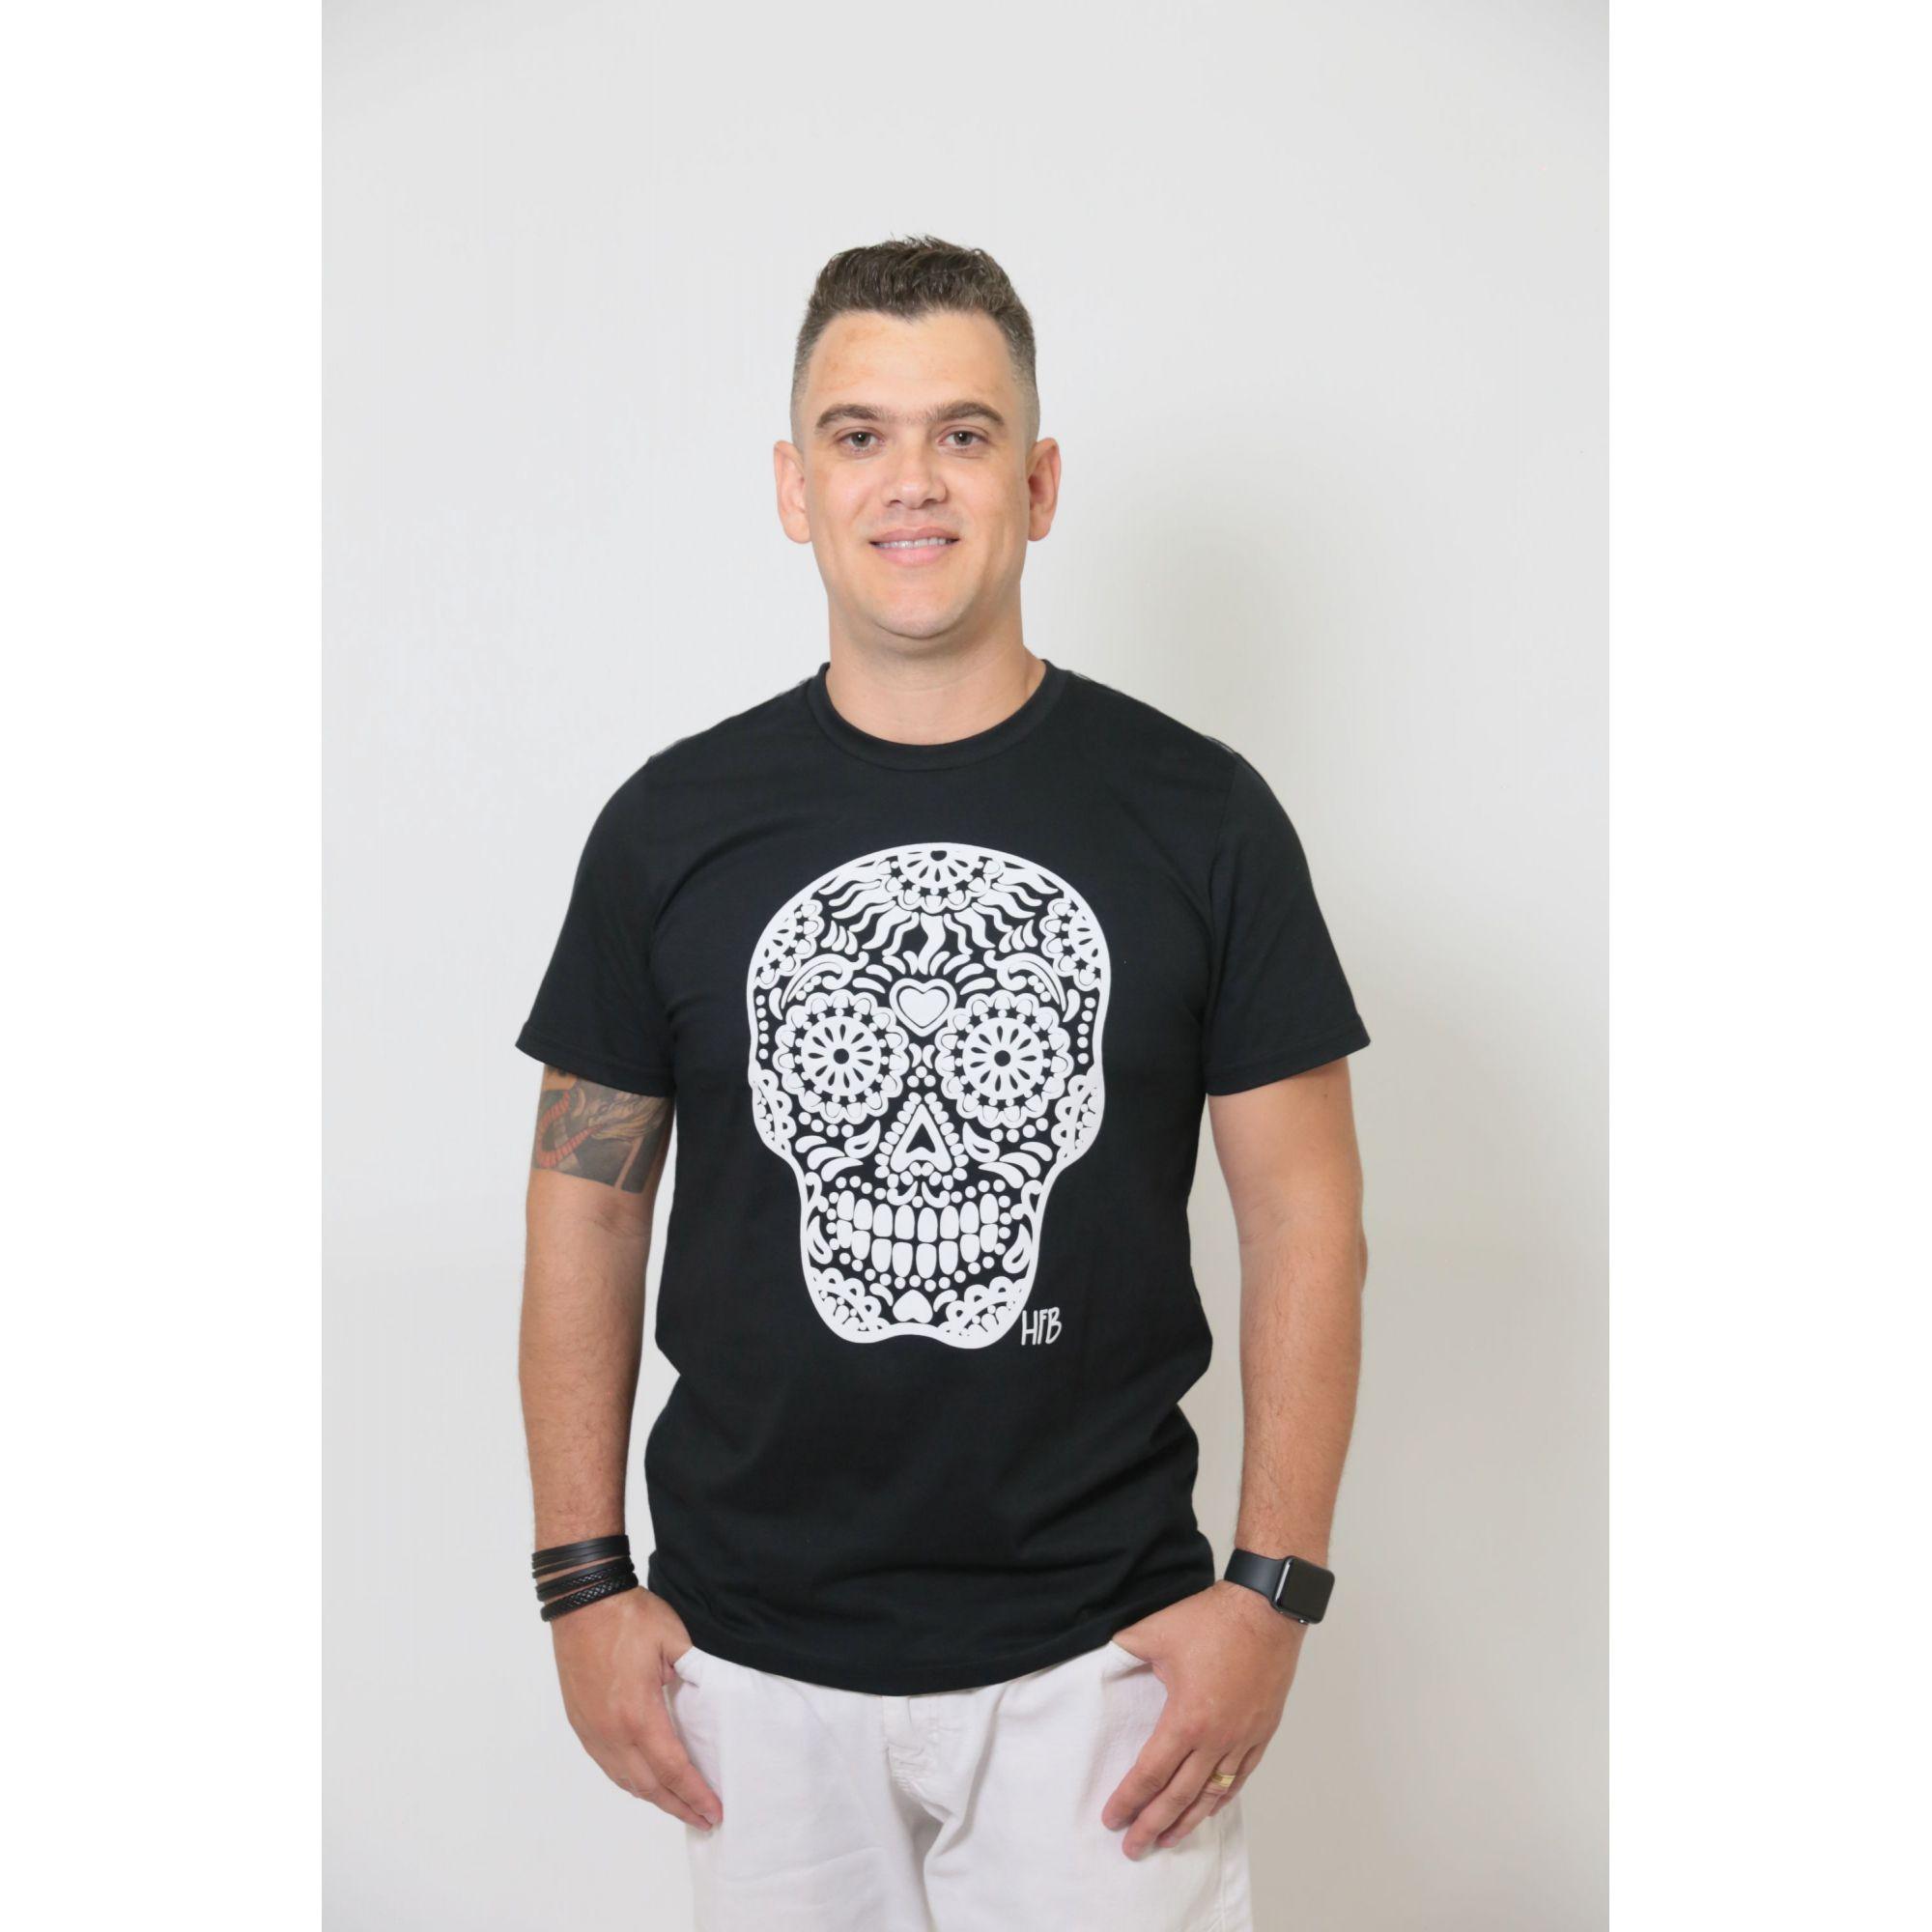 Camiseta Masculina Preta Caveira Alto Relevo  - Heitor Fashion Brazil